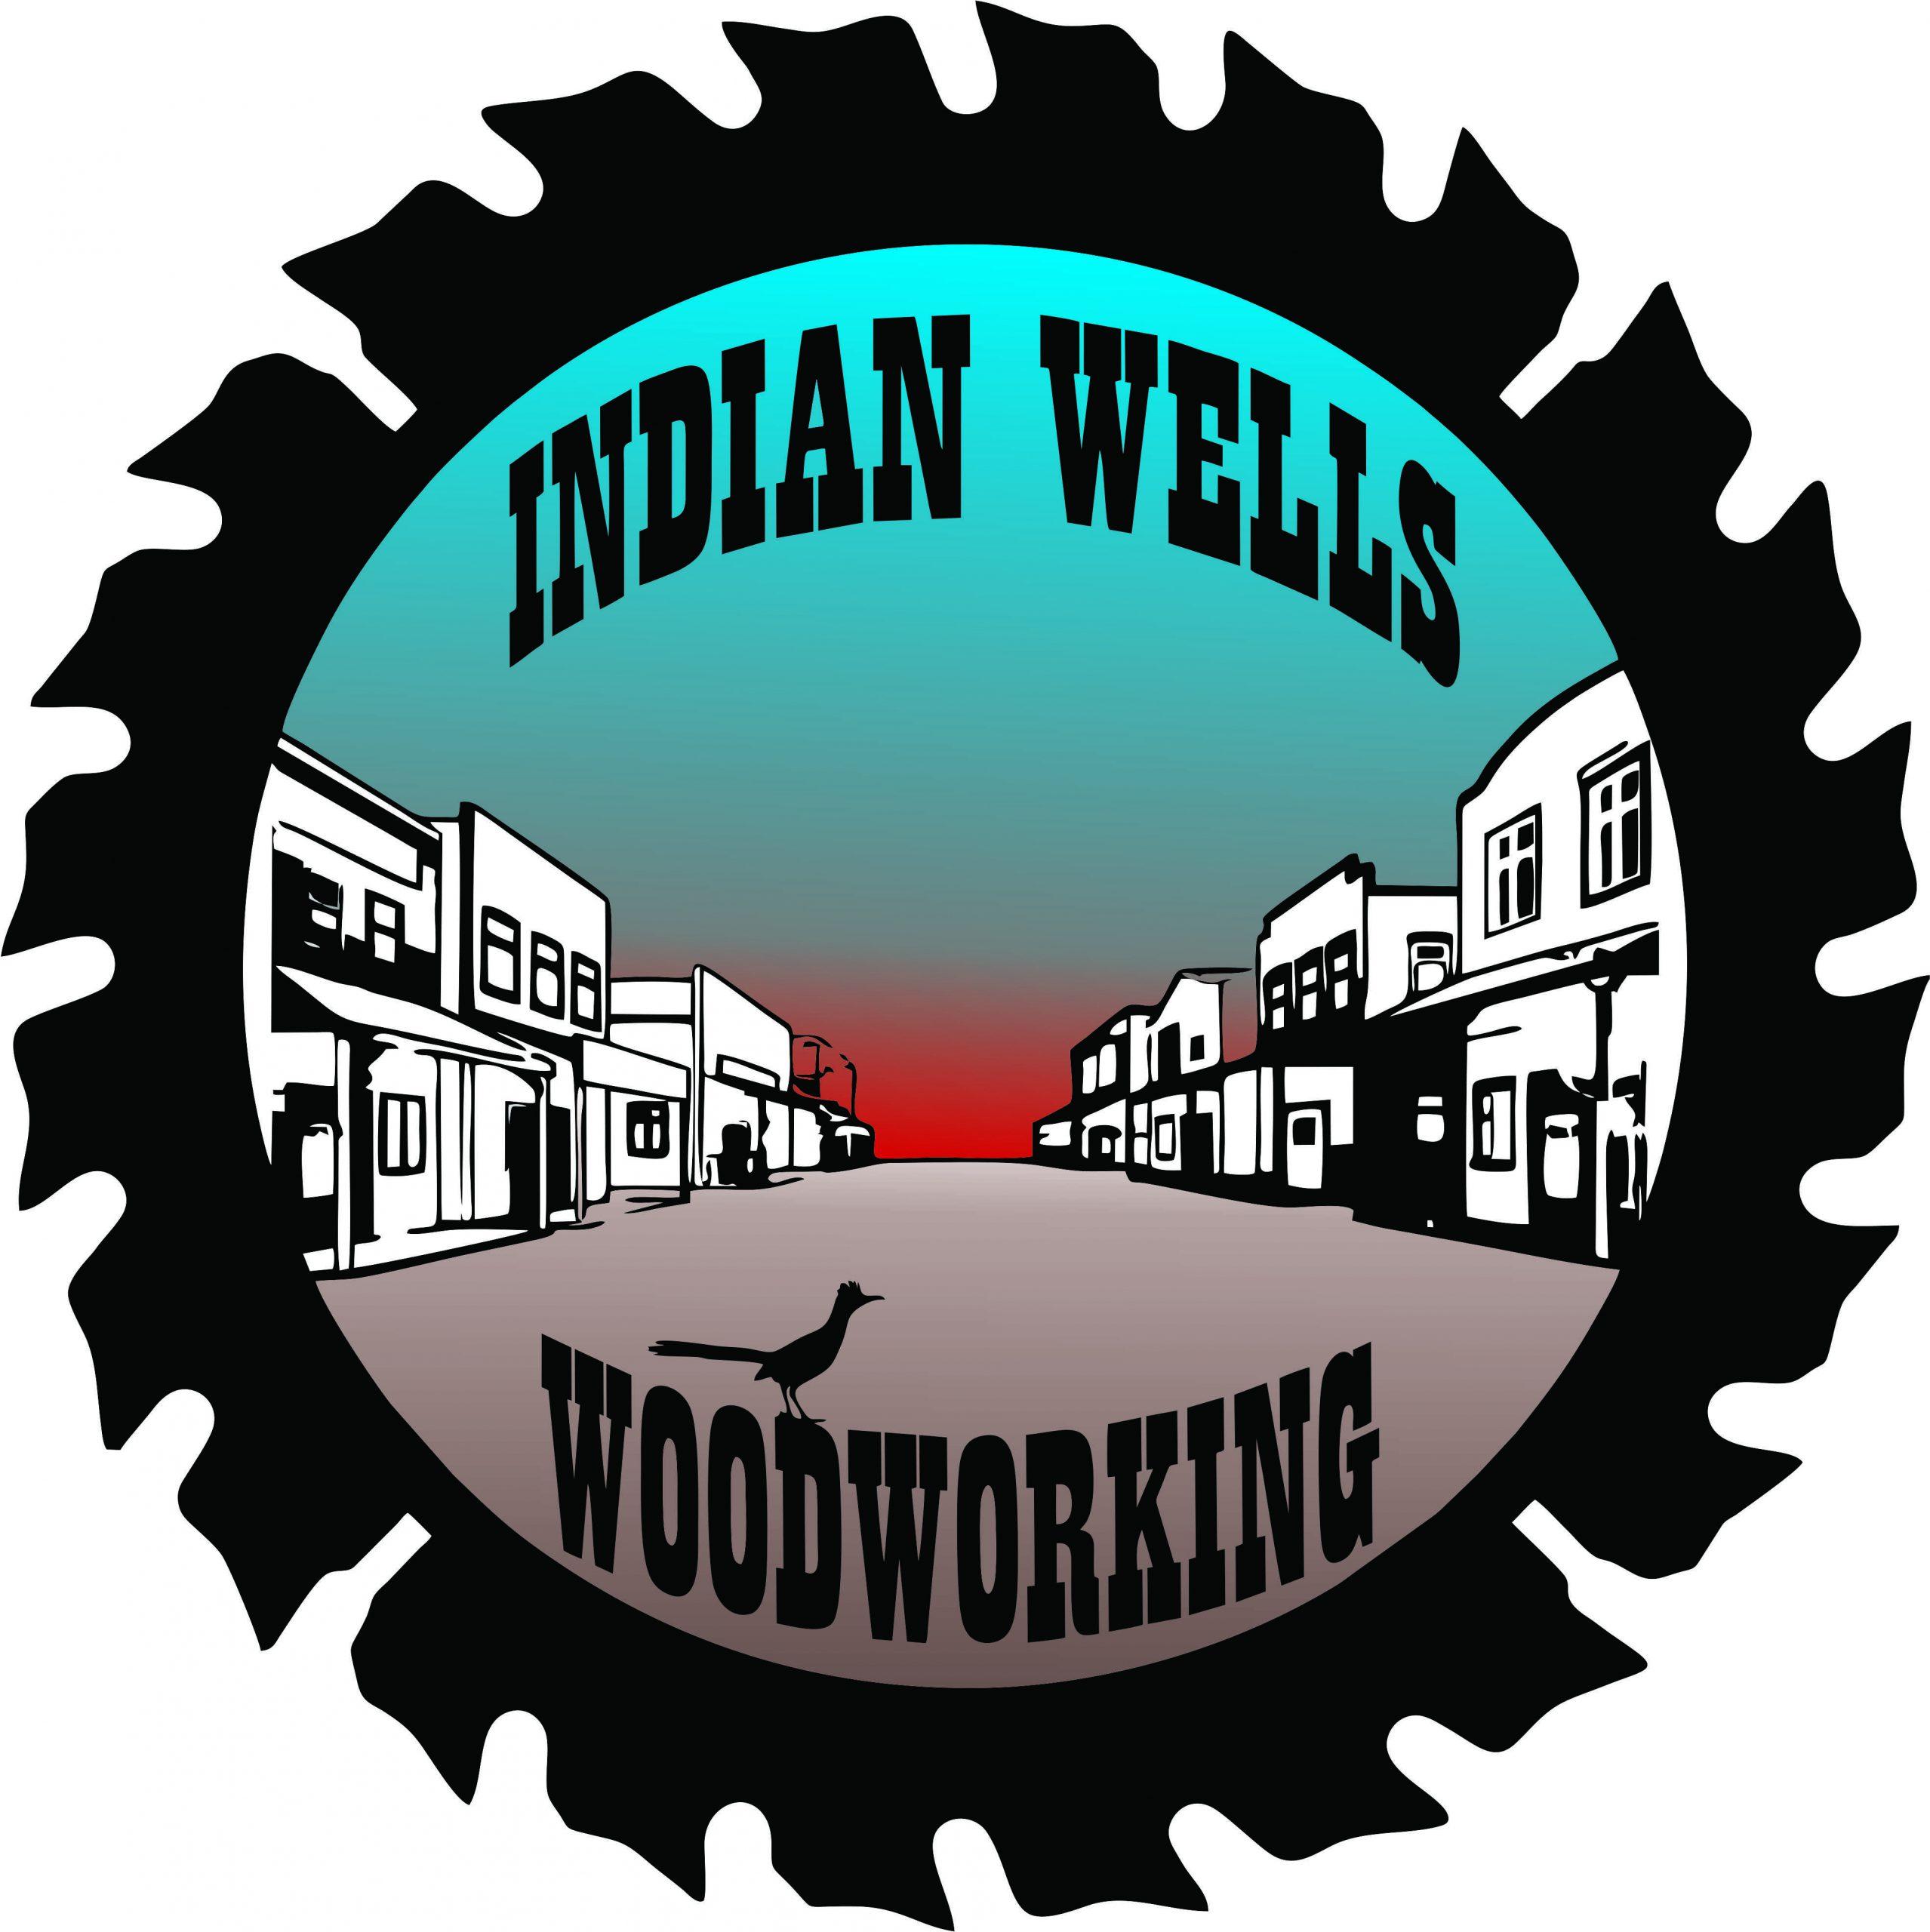 Indianwells woodworking